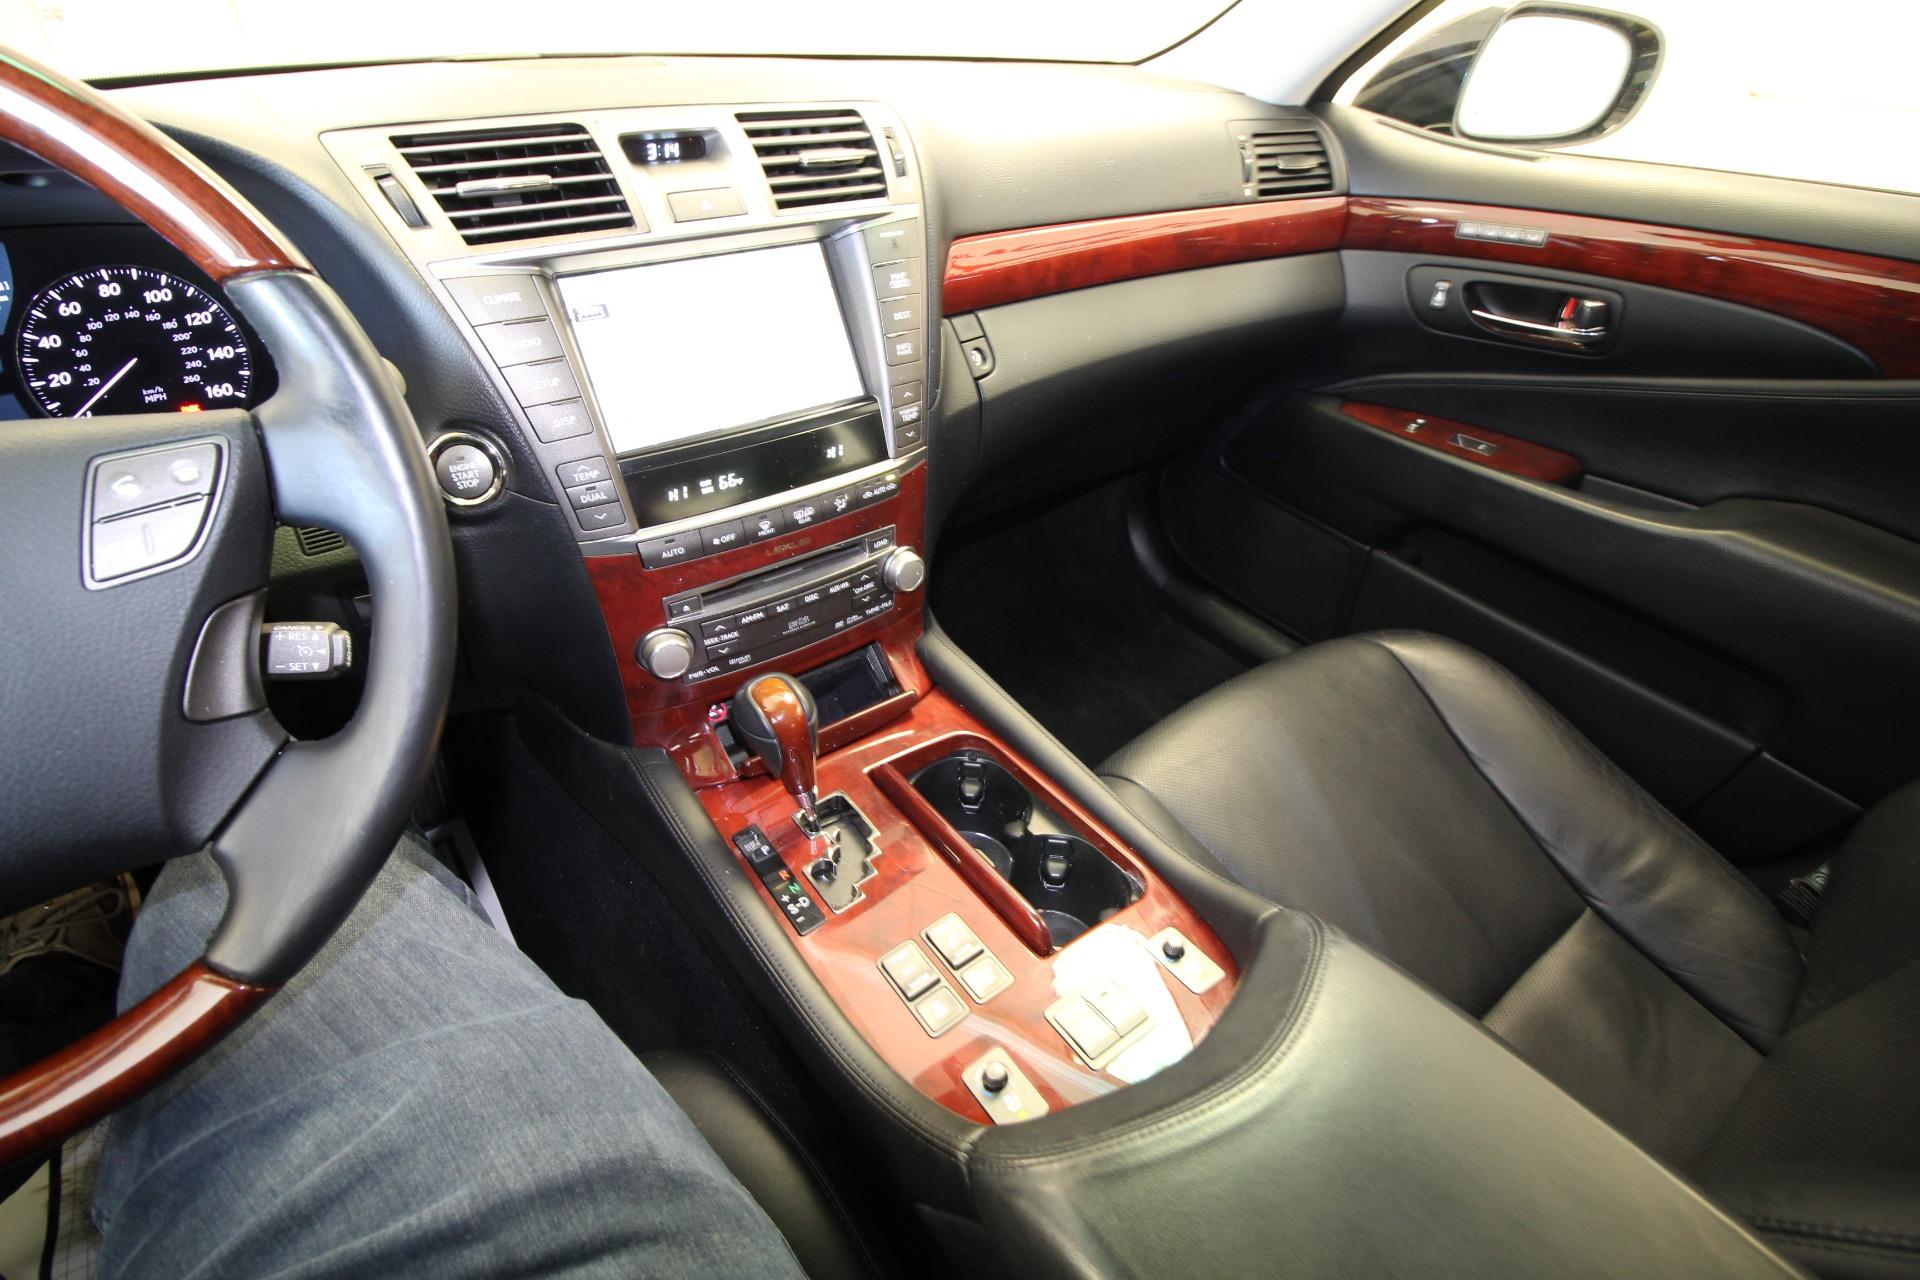 Used 2010 Lexus LS 460 Luxury Sedan AWD very well maintained 90k service | Albany, NY